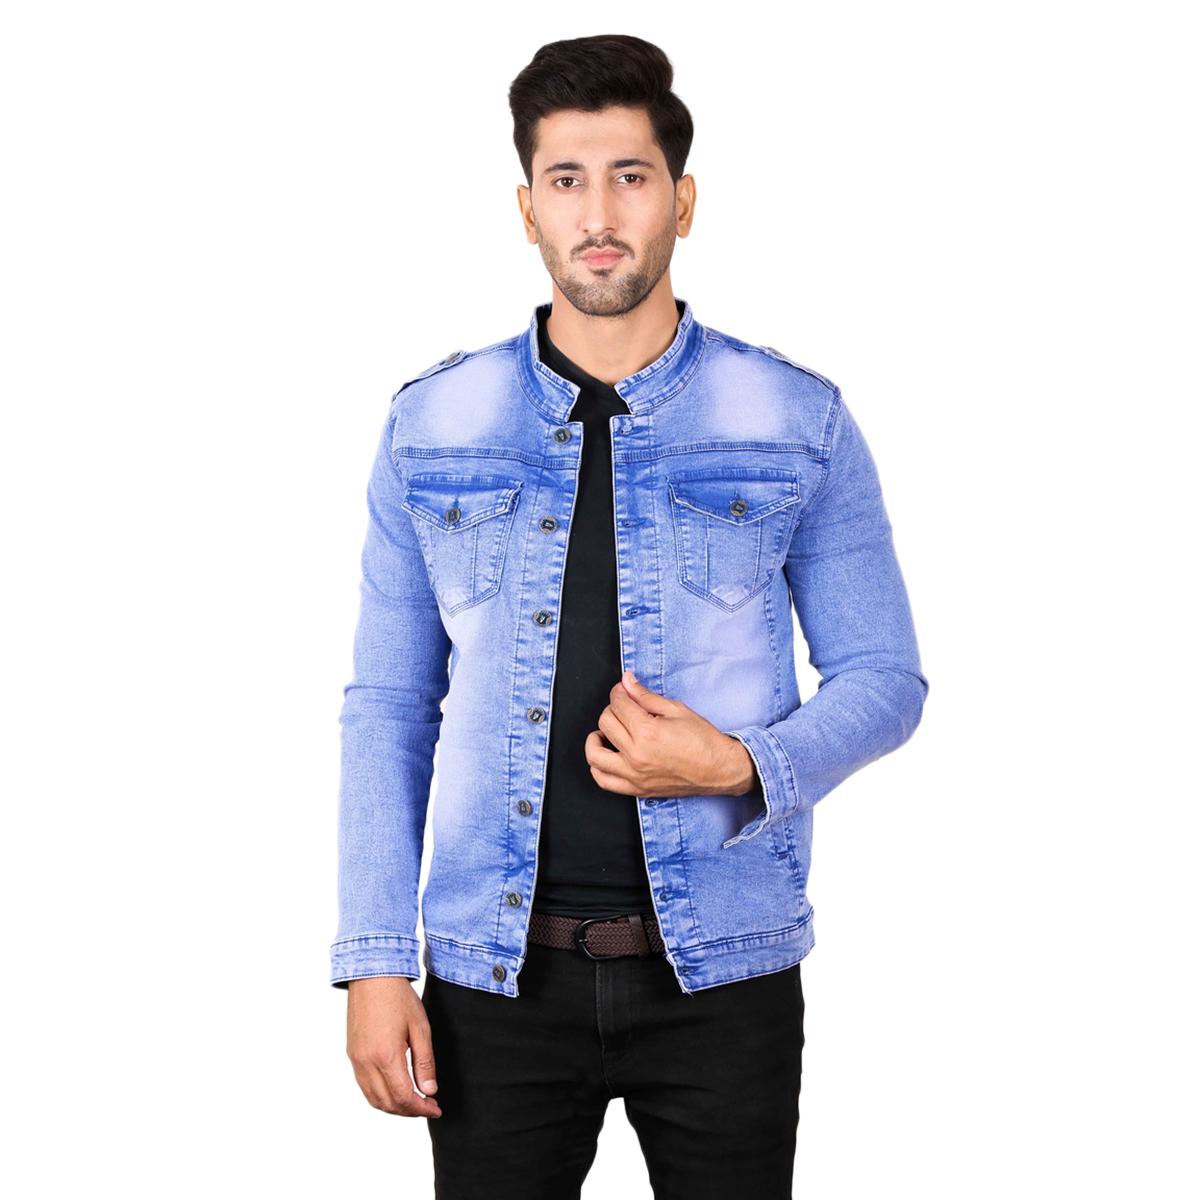 Cut Price Denim Jacket For Men in Multicolor